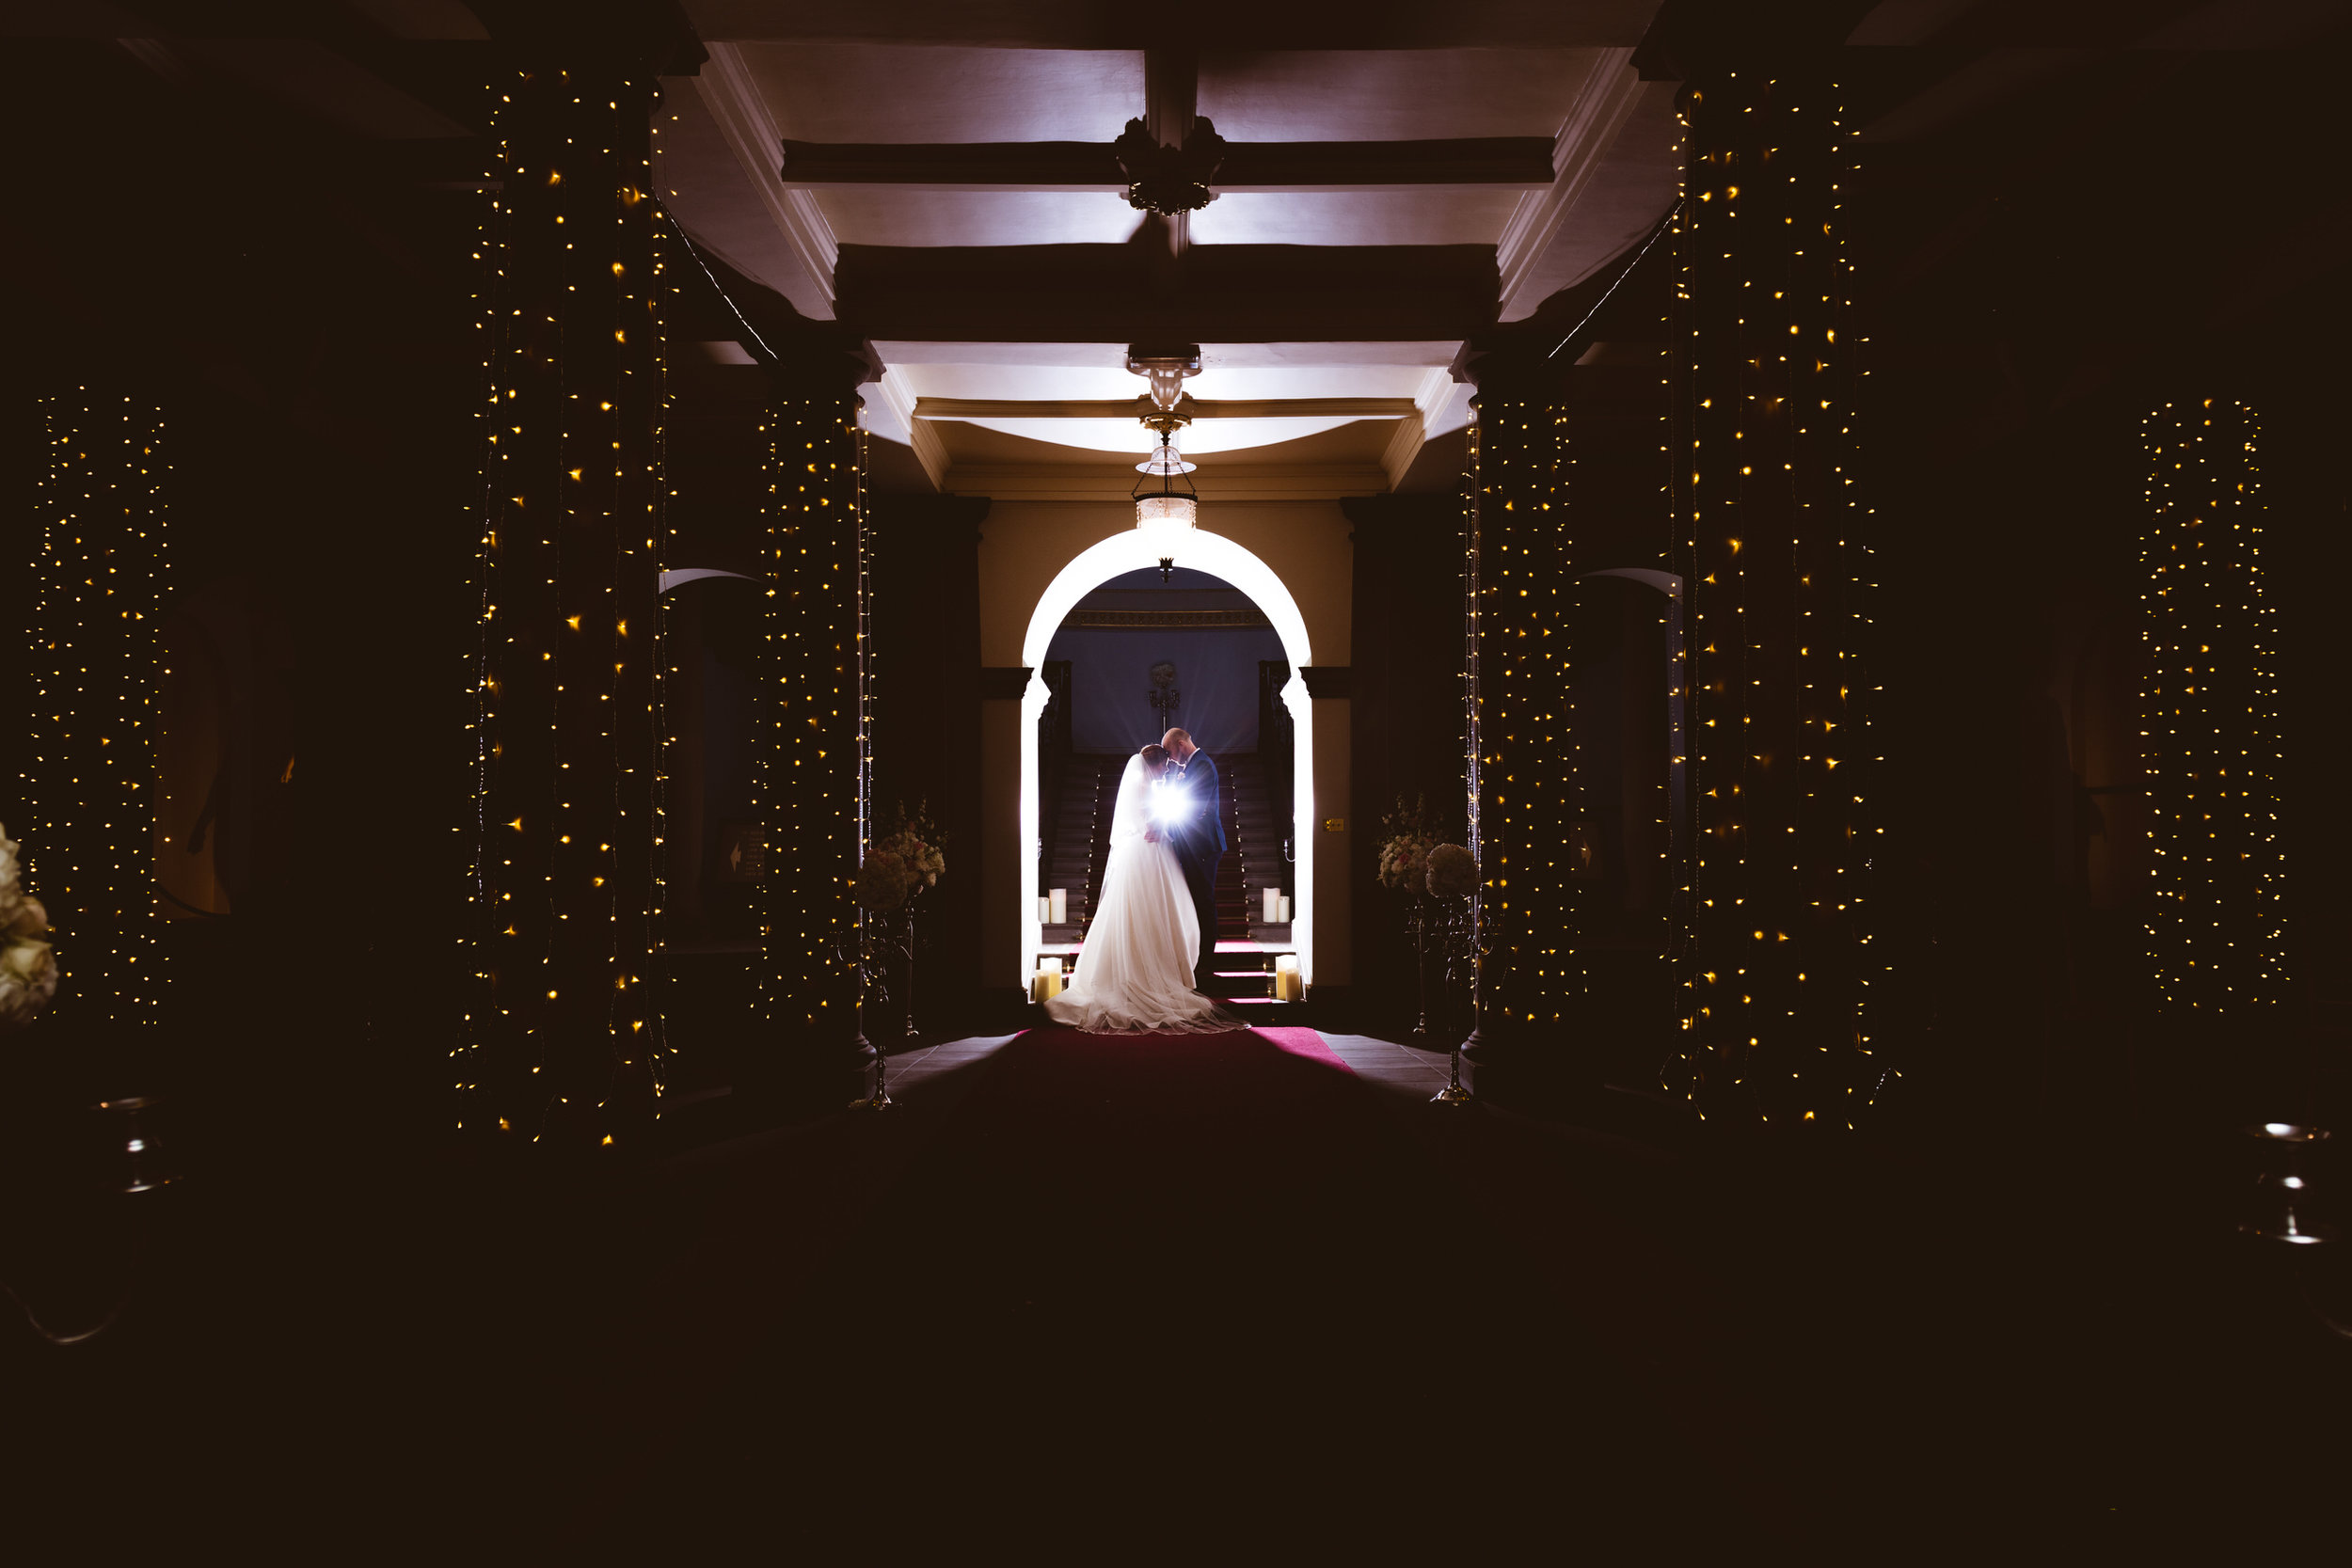 wentworth-woodhous-yorkshire-wedding-photographer-134.jpg